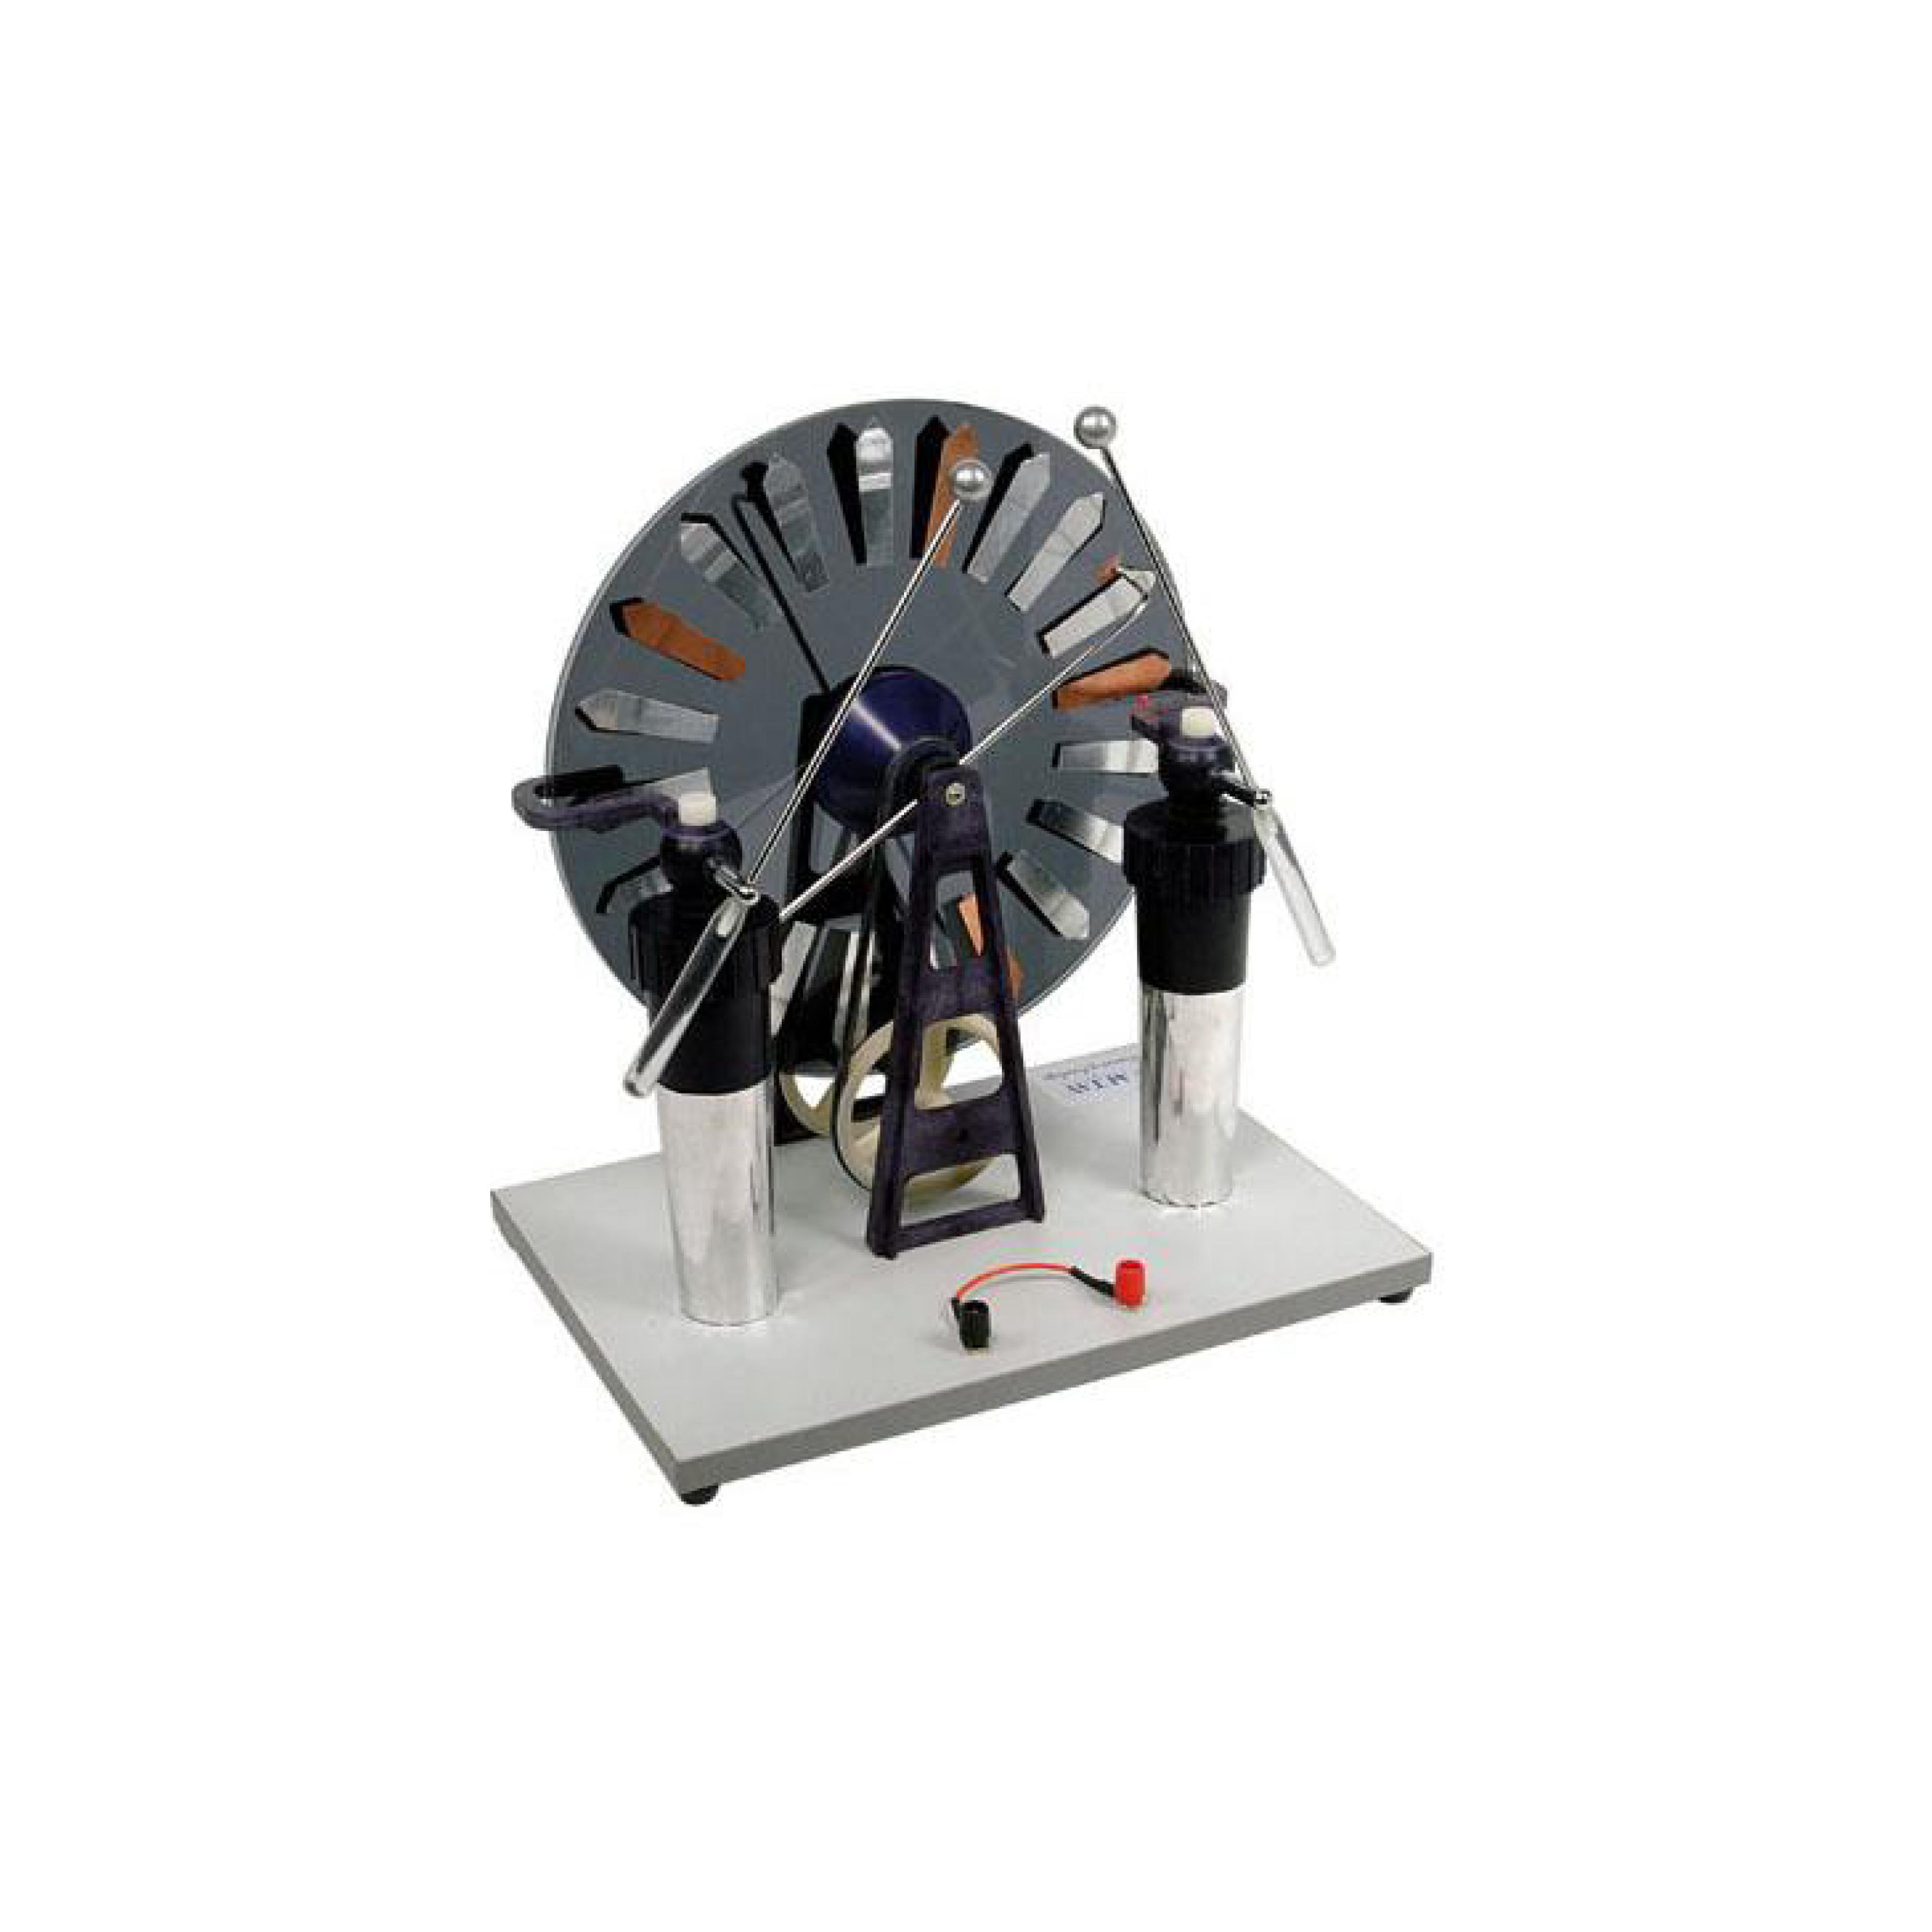 Wimshurst Machine_Tavola disegno 1_Multiuse system